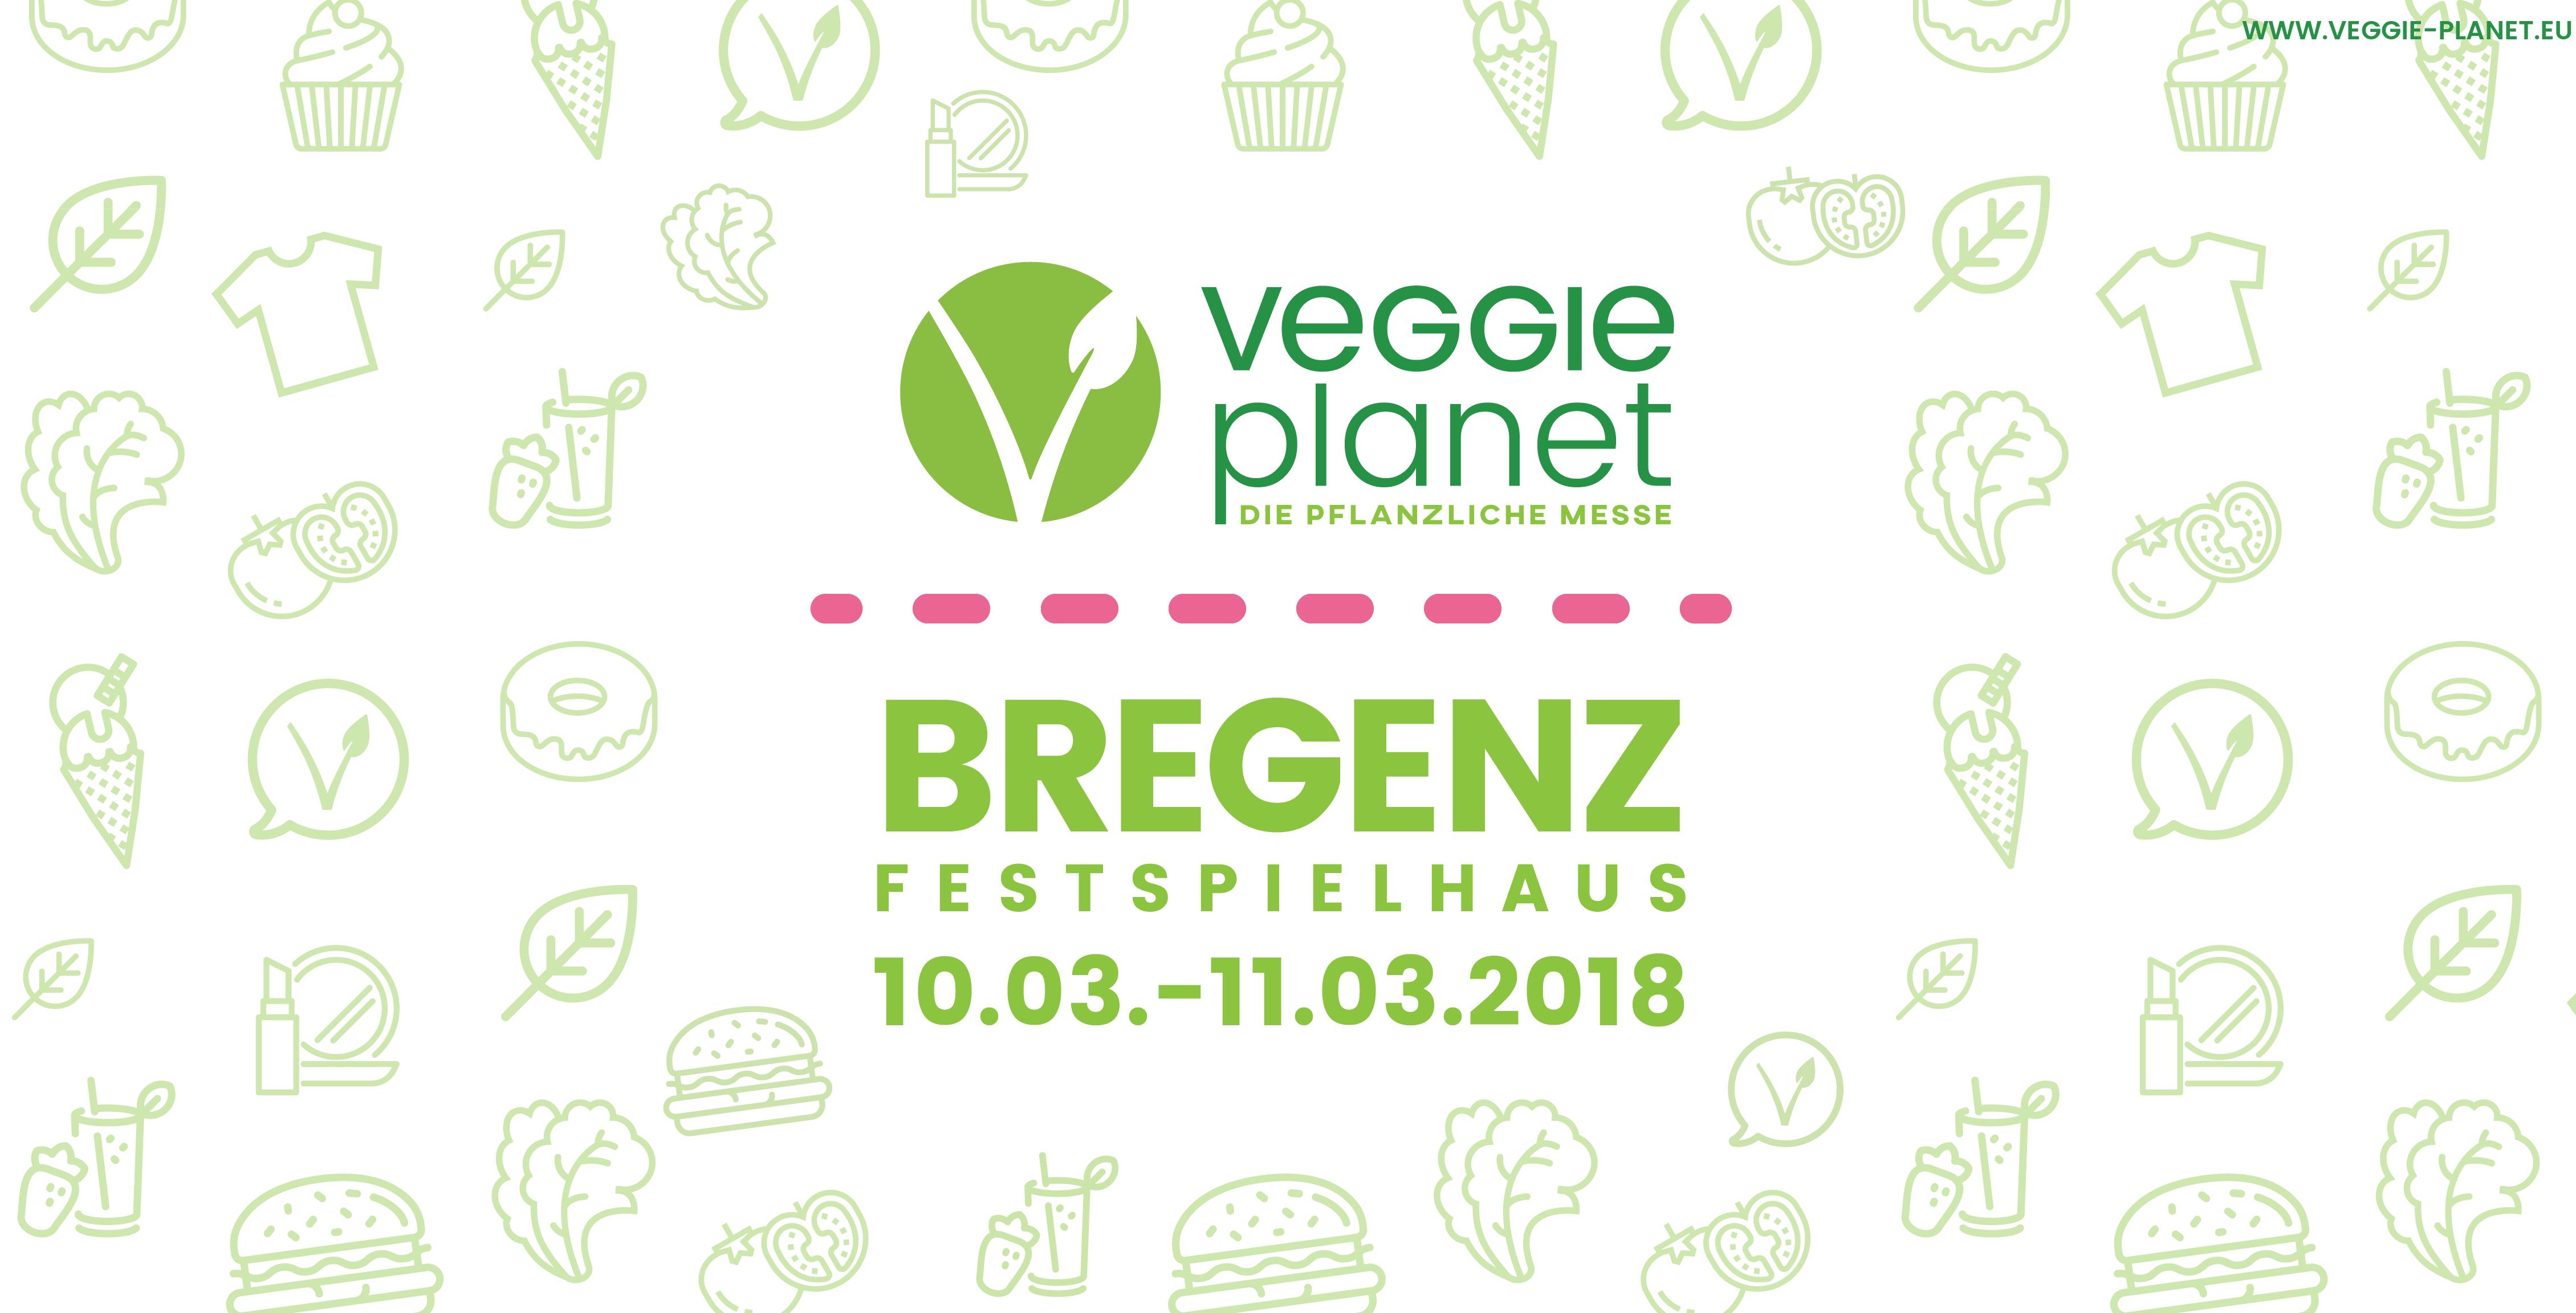 veggieplanet_bregenz_fb-01 copy